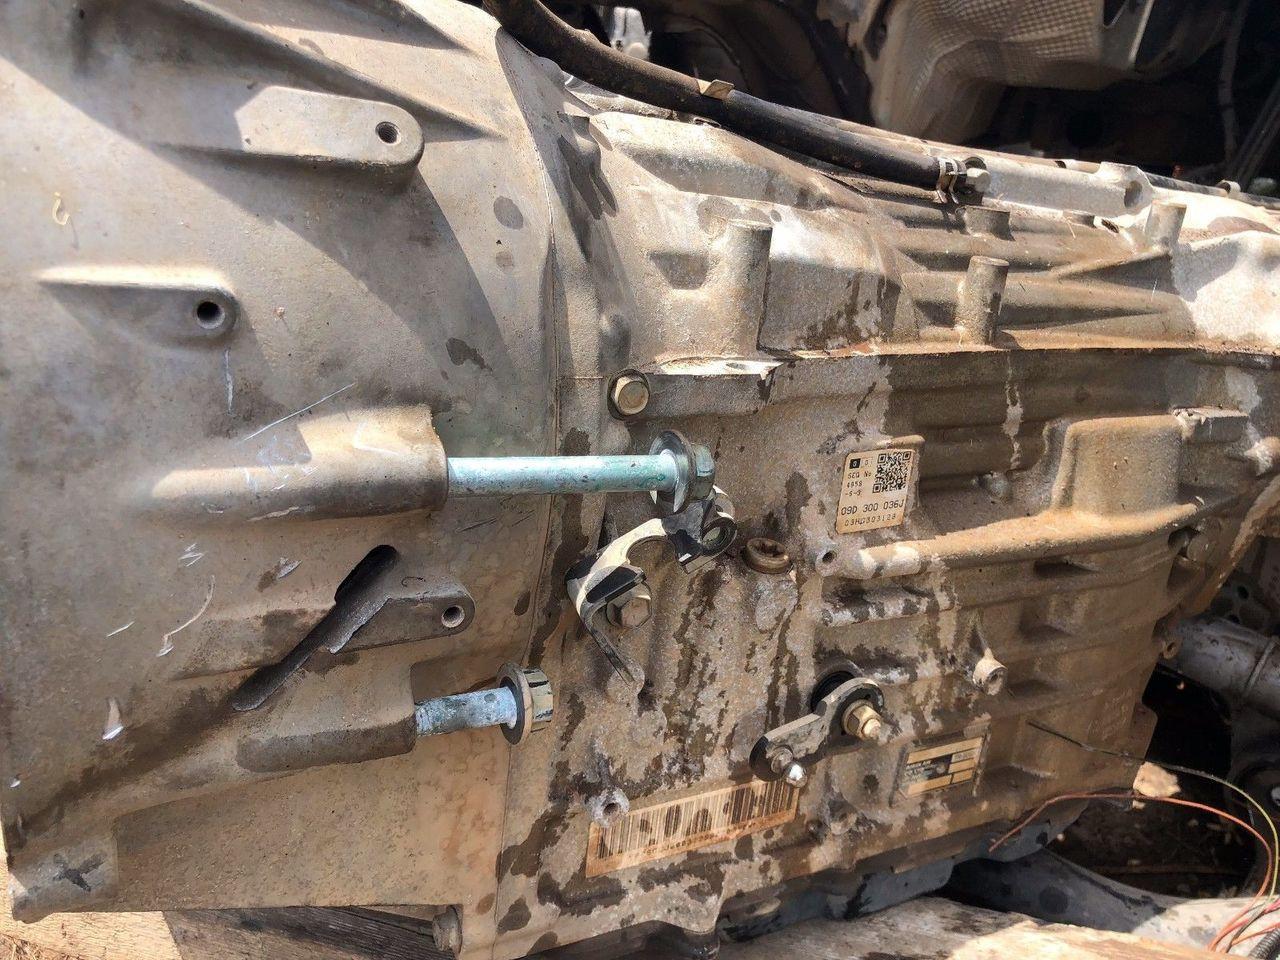 VW TOUAREG V6 PETROL 2003-2005 USED TRANSMISSION AISIN AW GLJ CODE